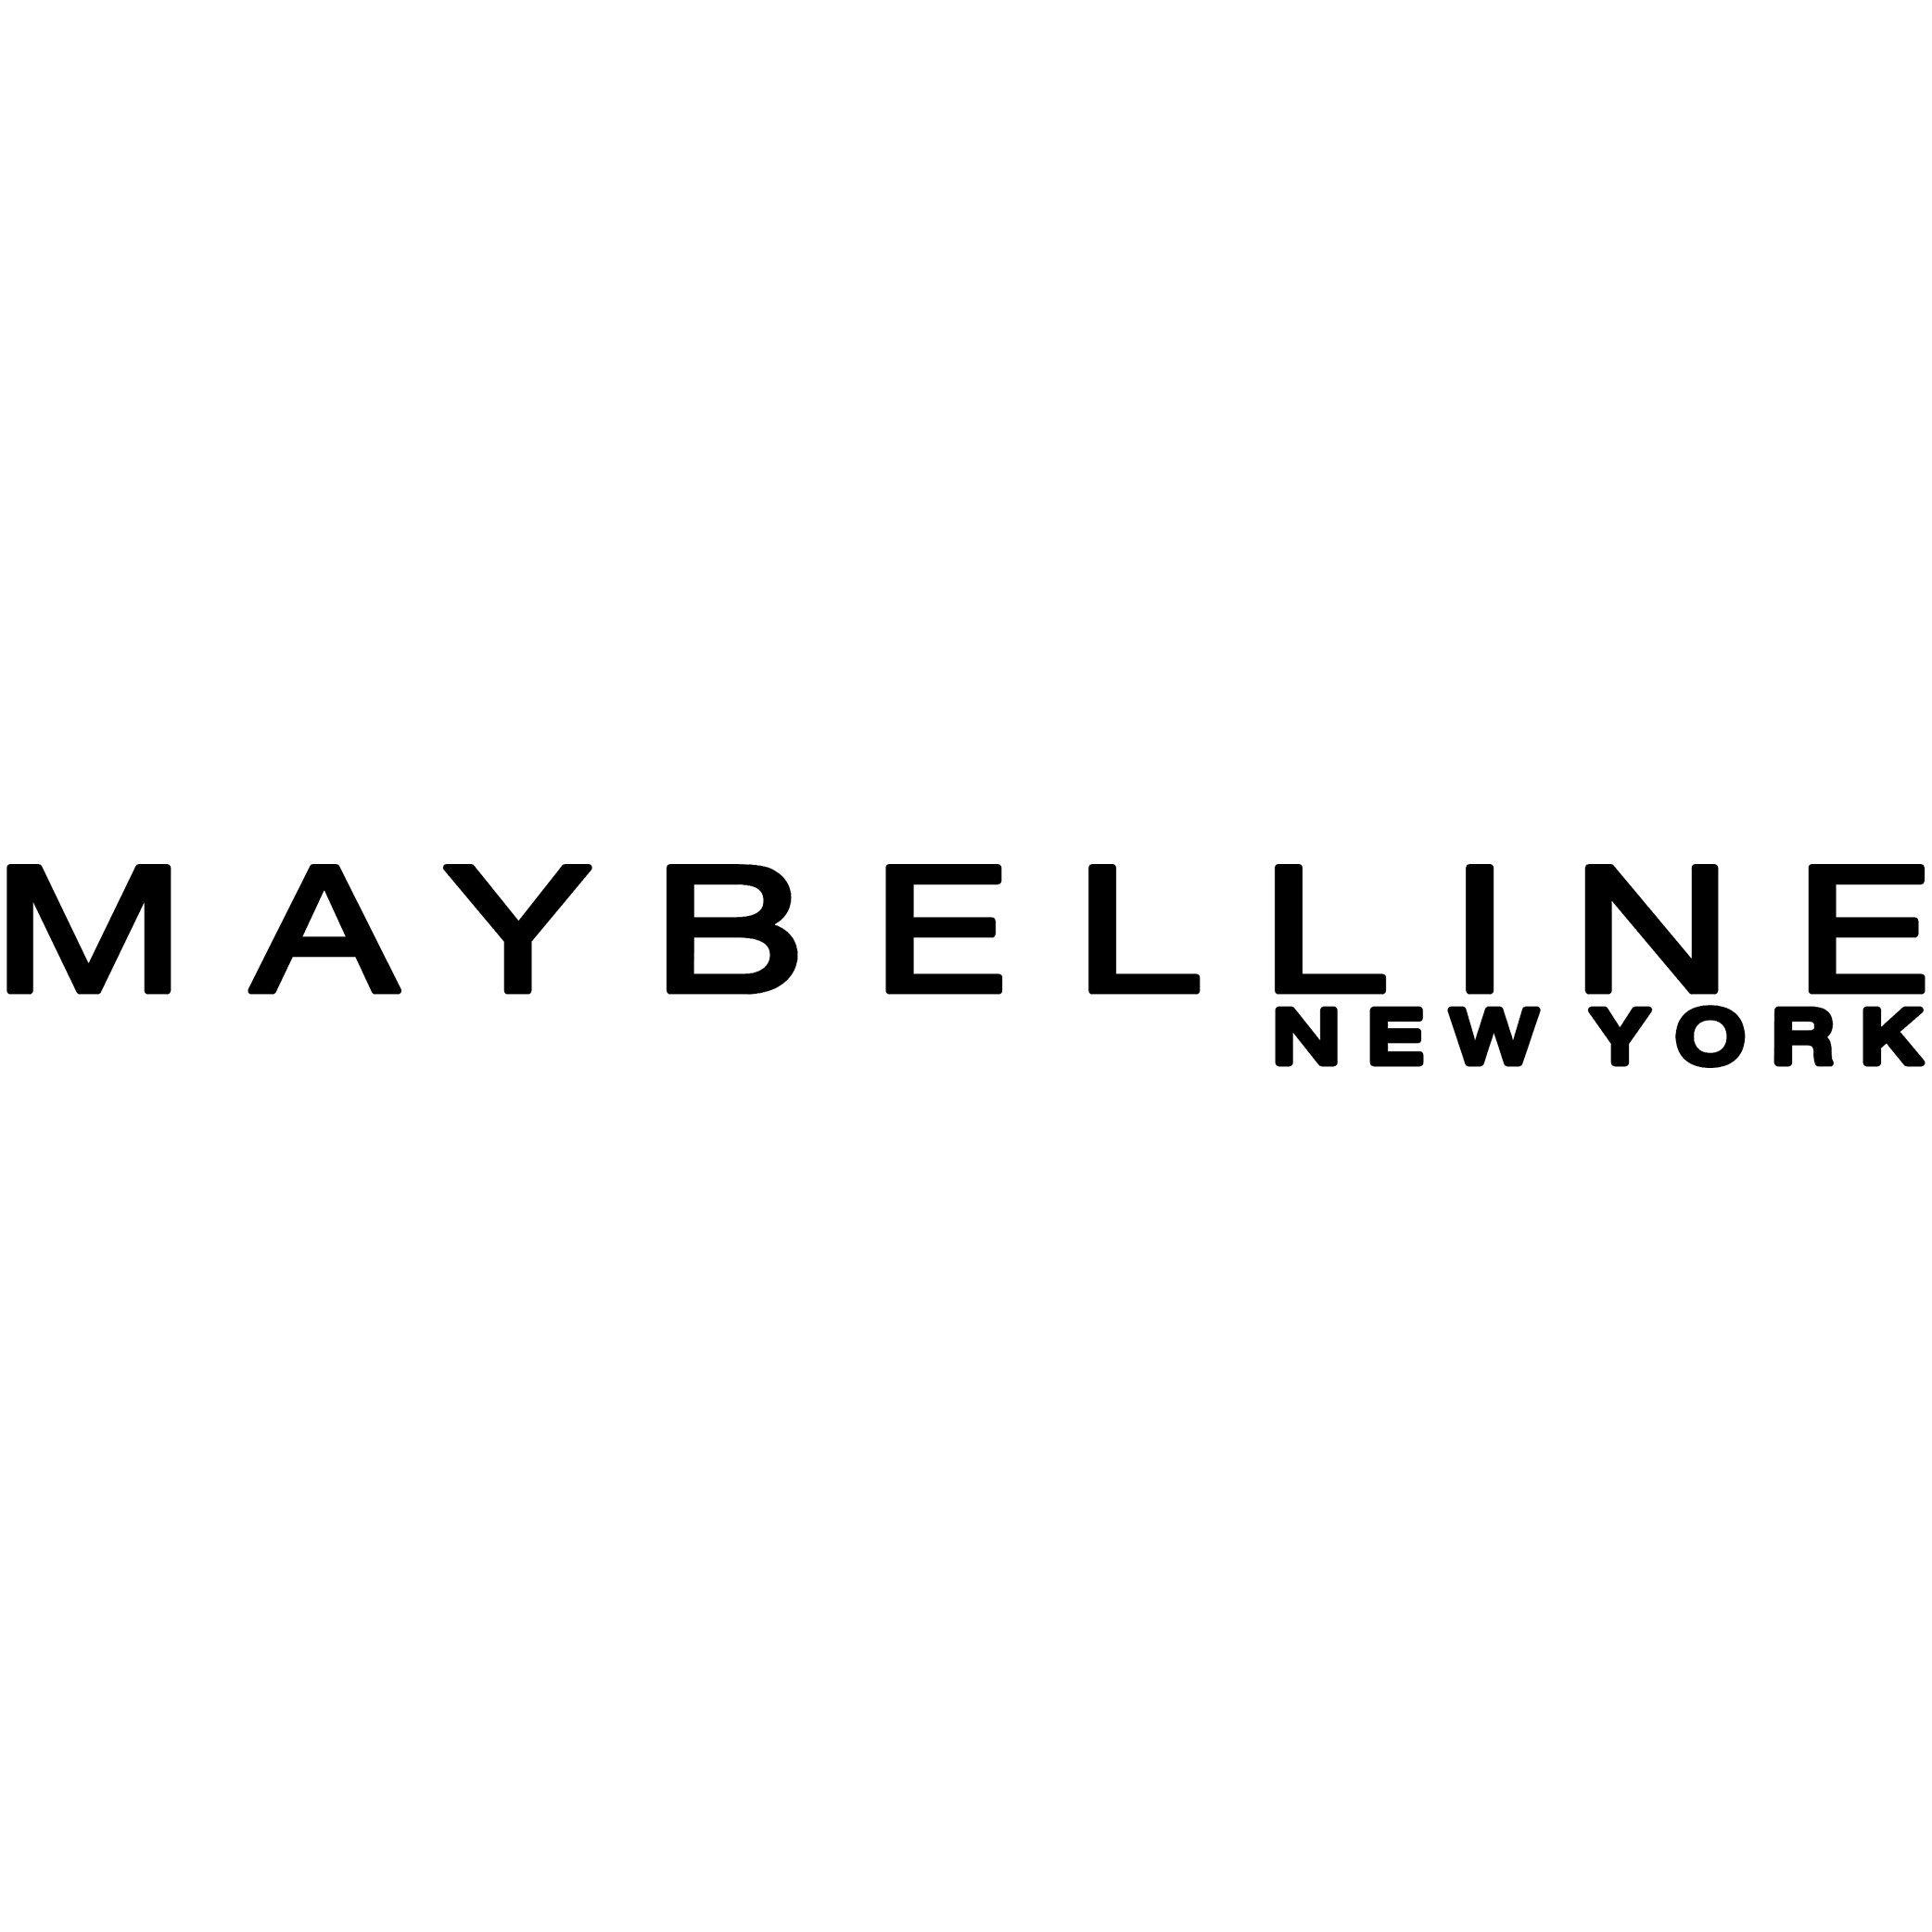 Maybelline's logo